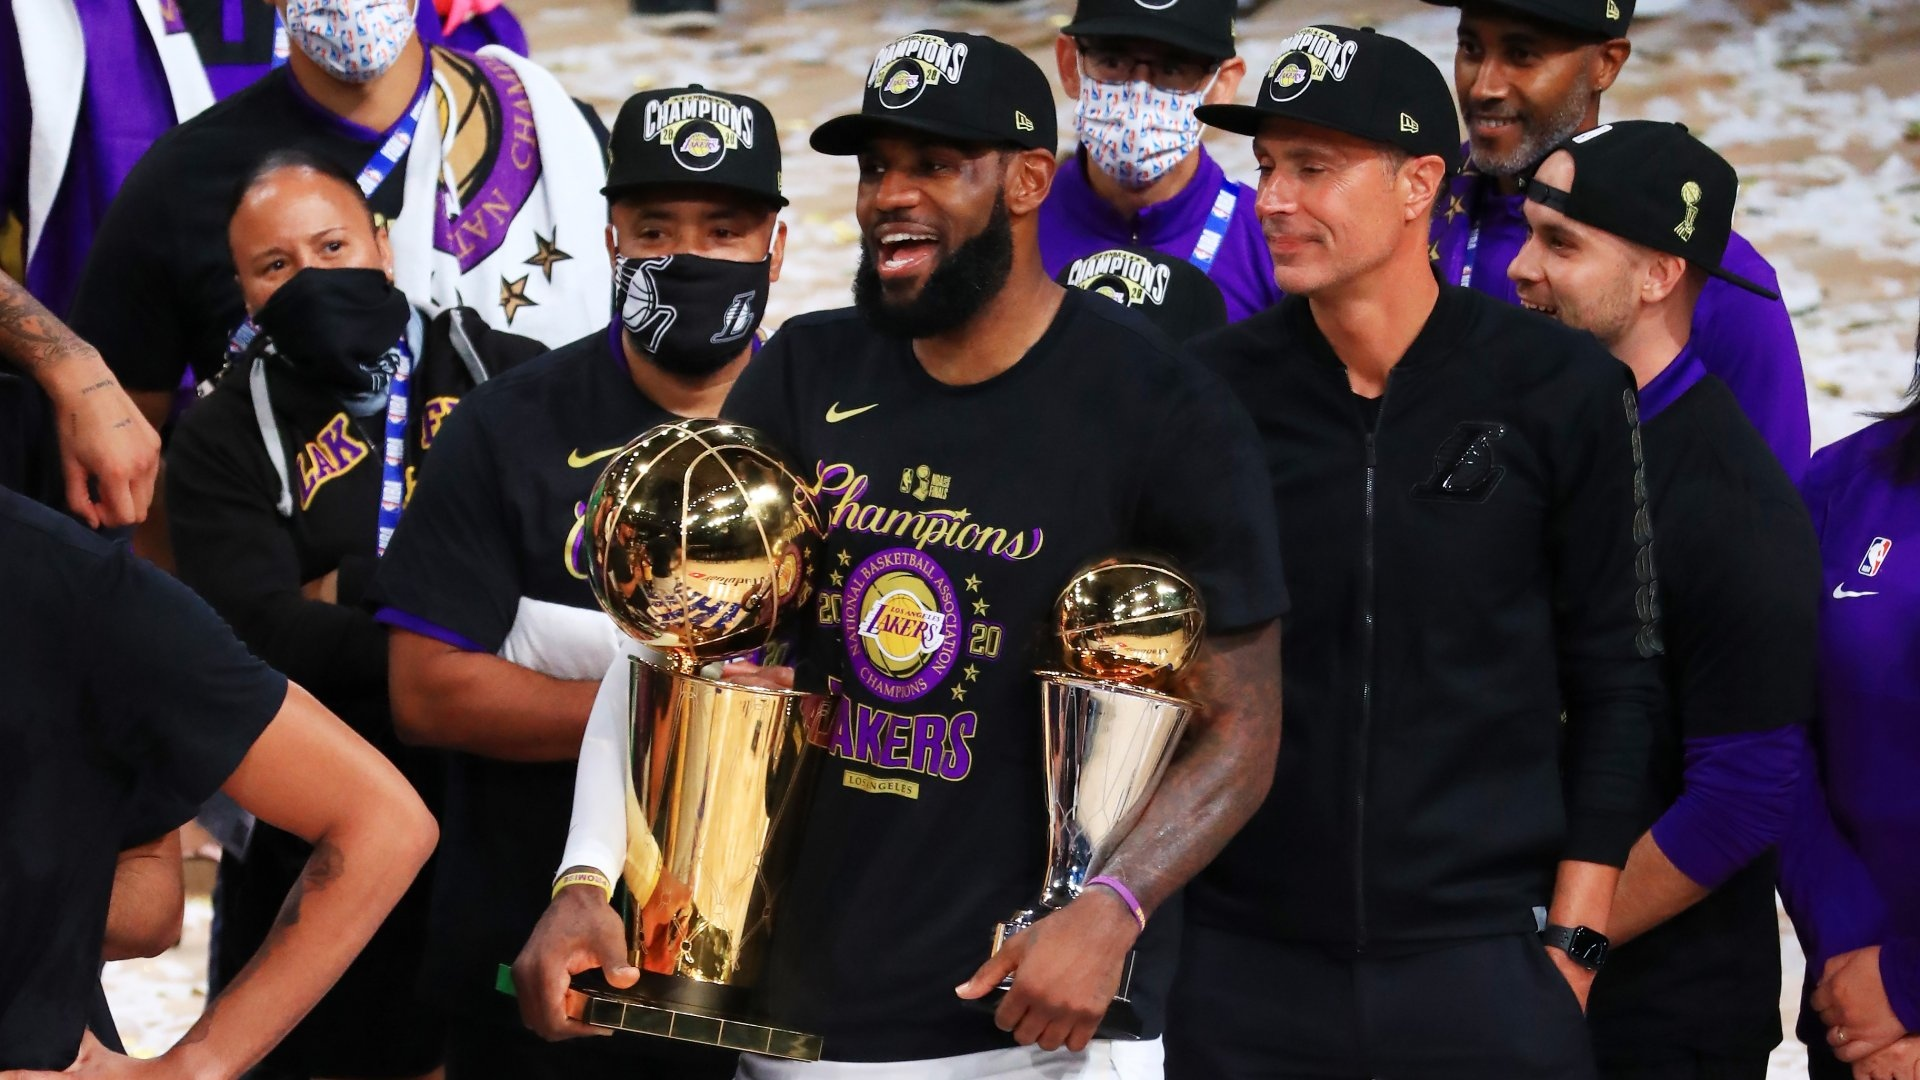 Lakers9.jpg